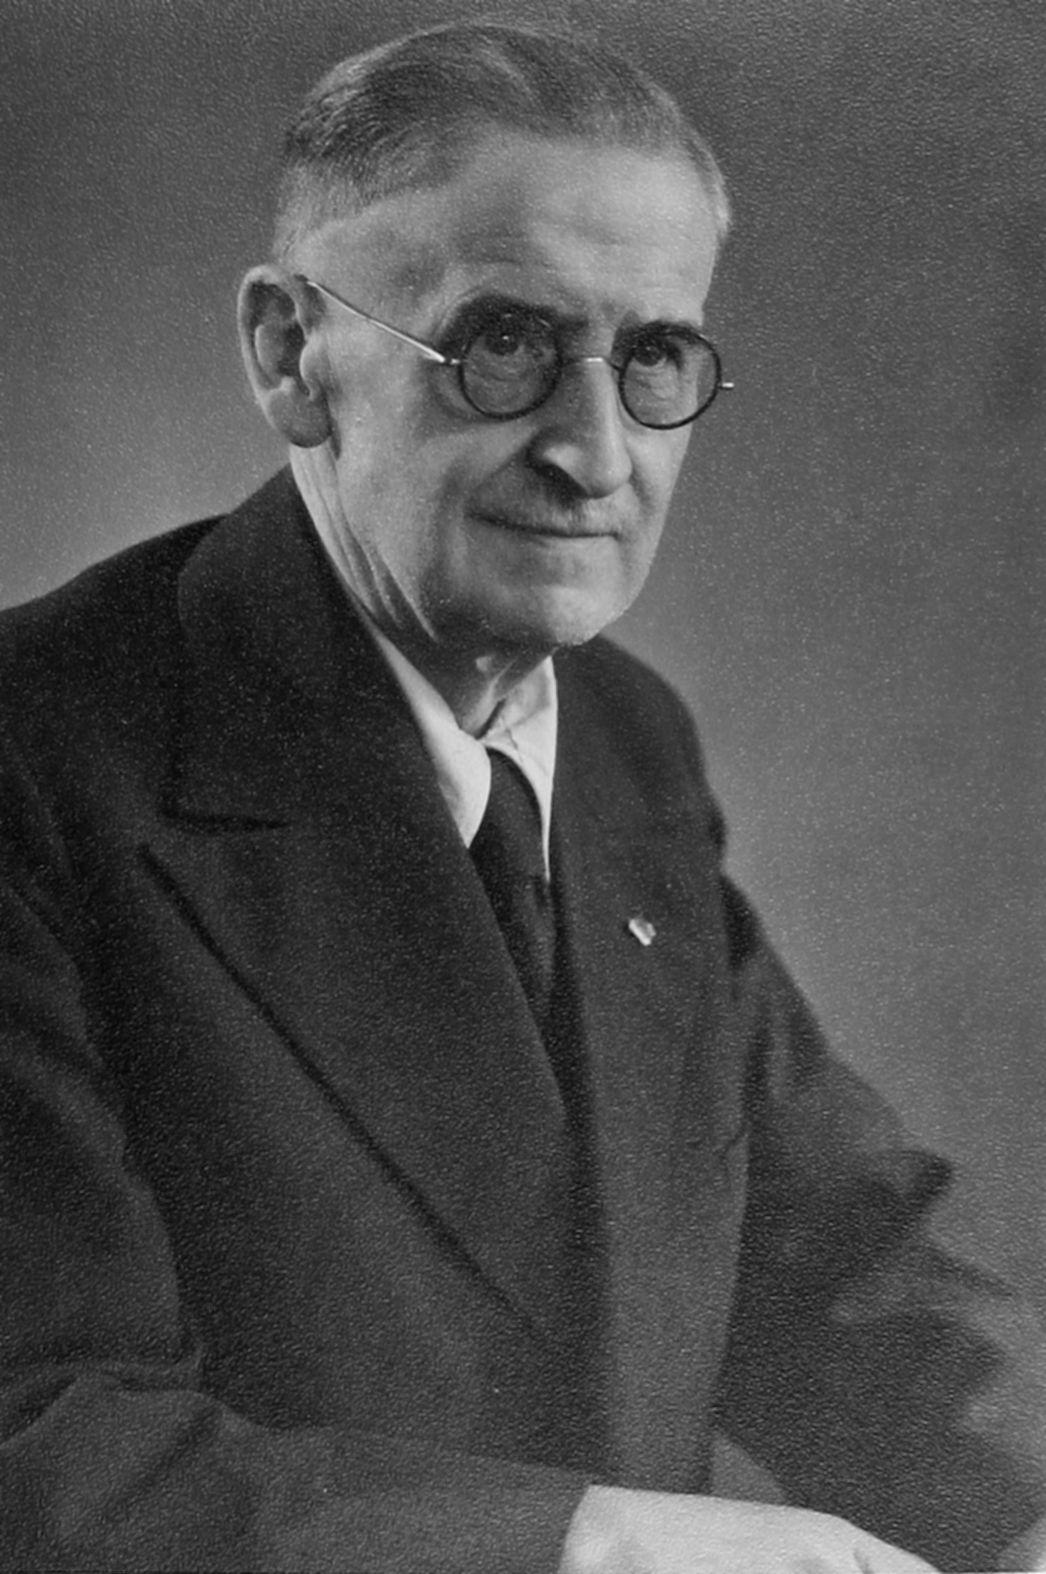 Paul Rhode (Foto: Stadtarchiv Recklinghausen)